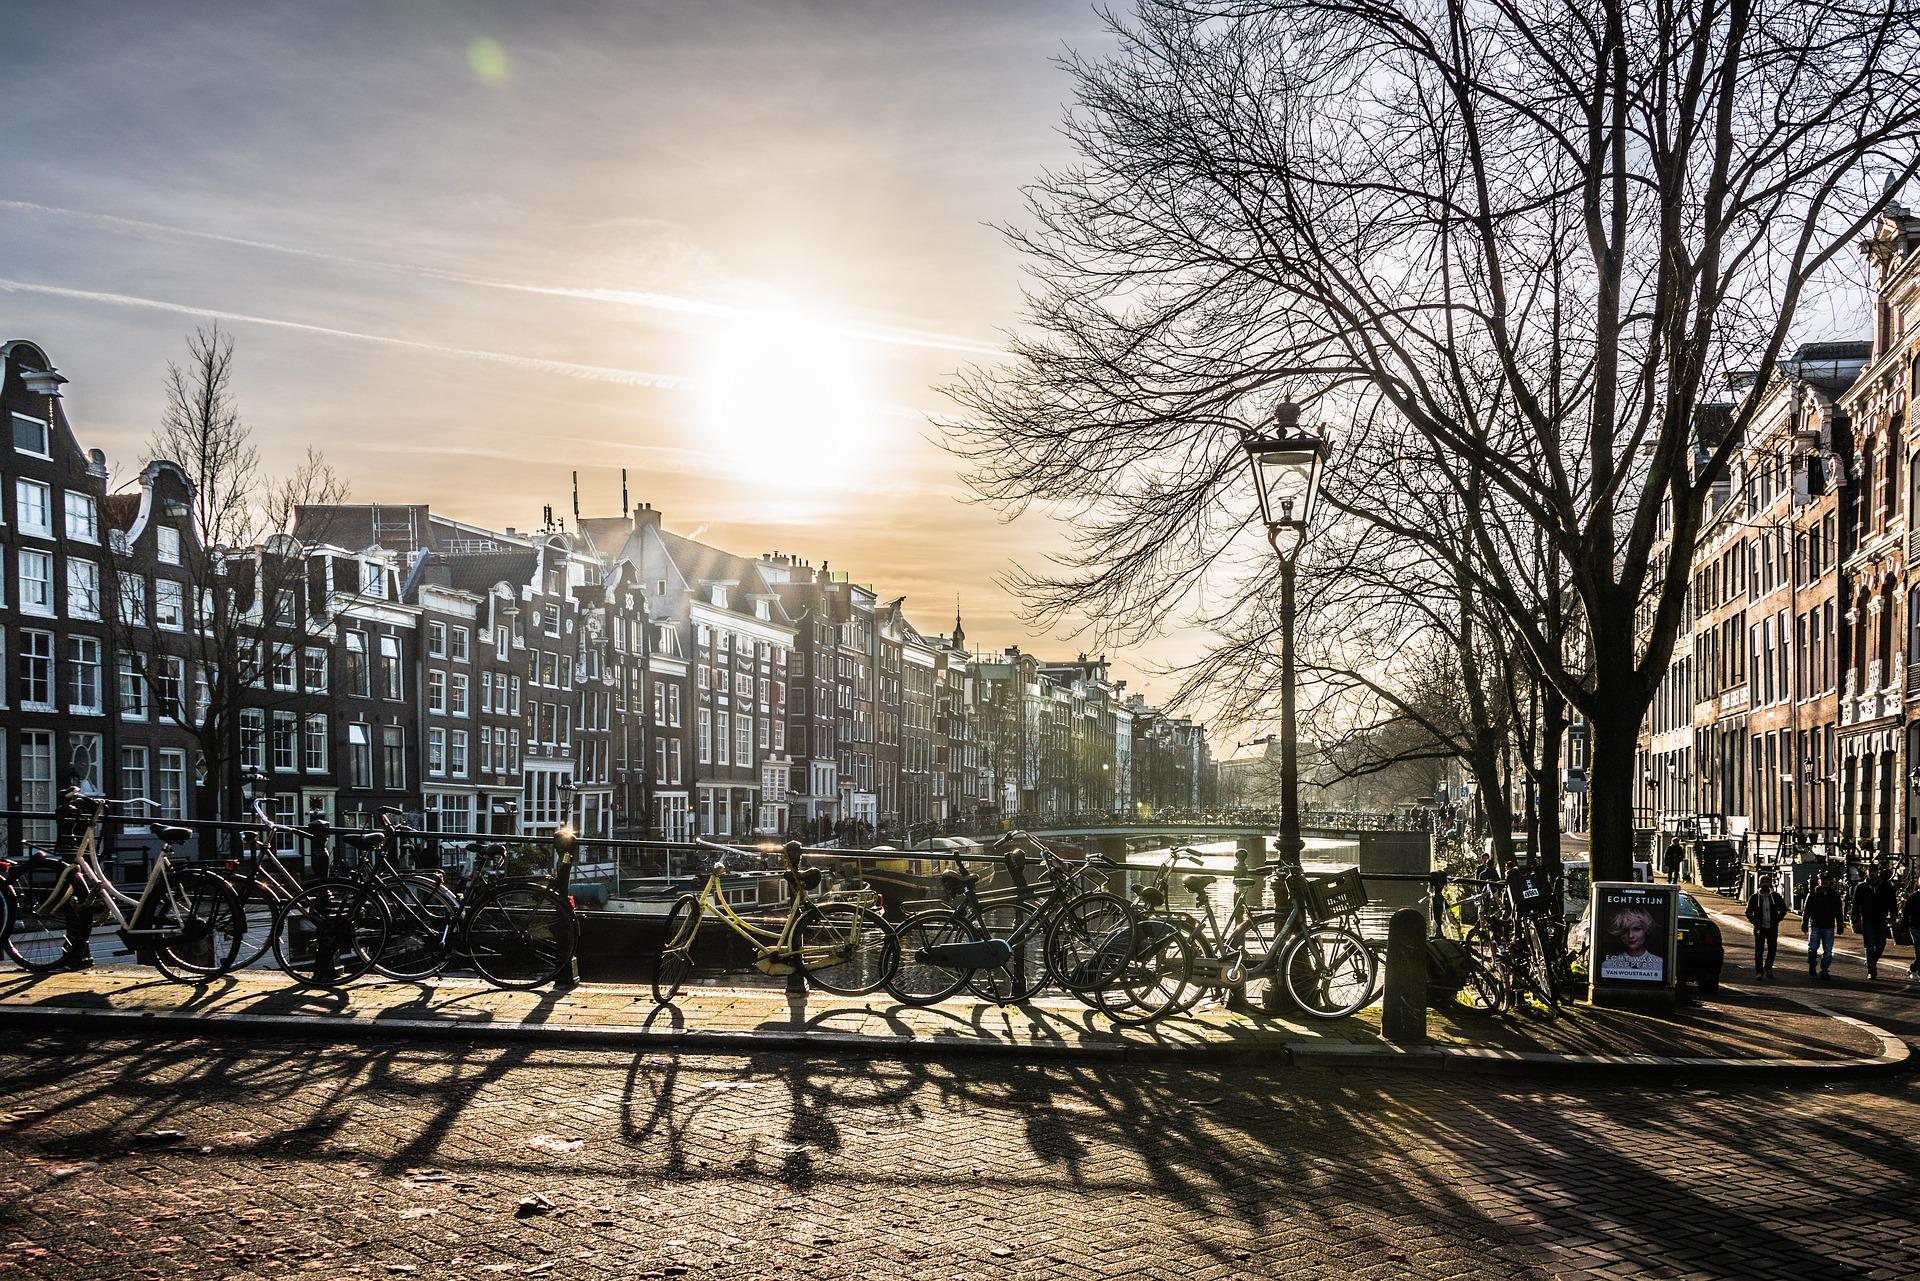 Auslandssemester in den Niederlanden